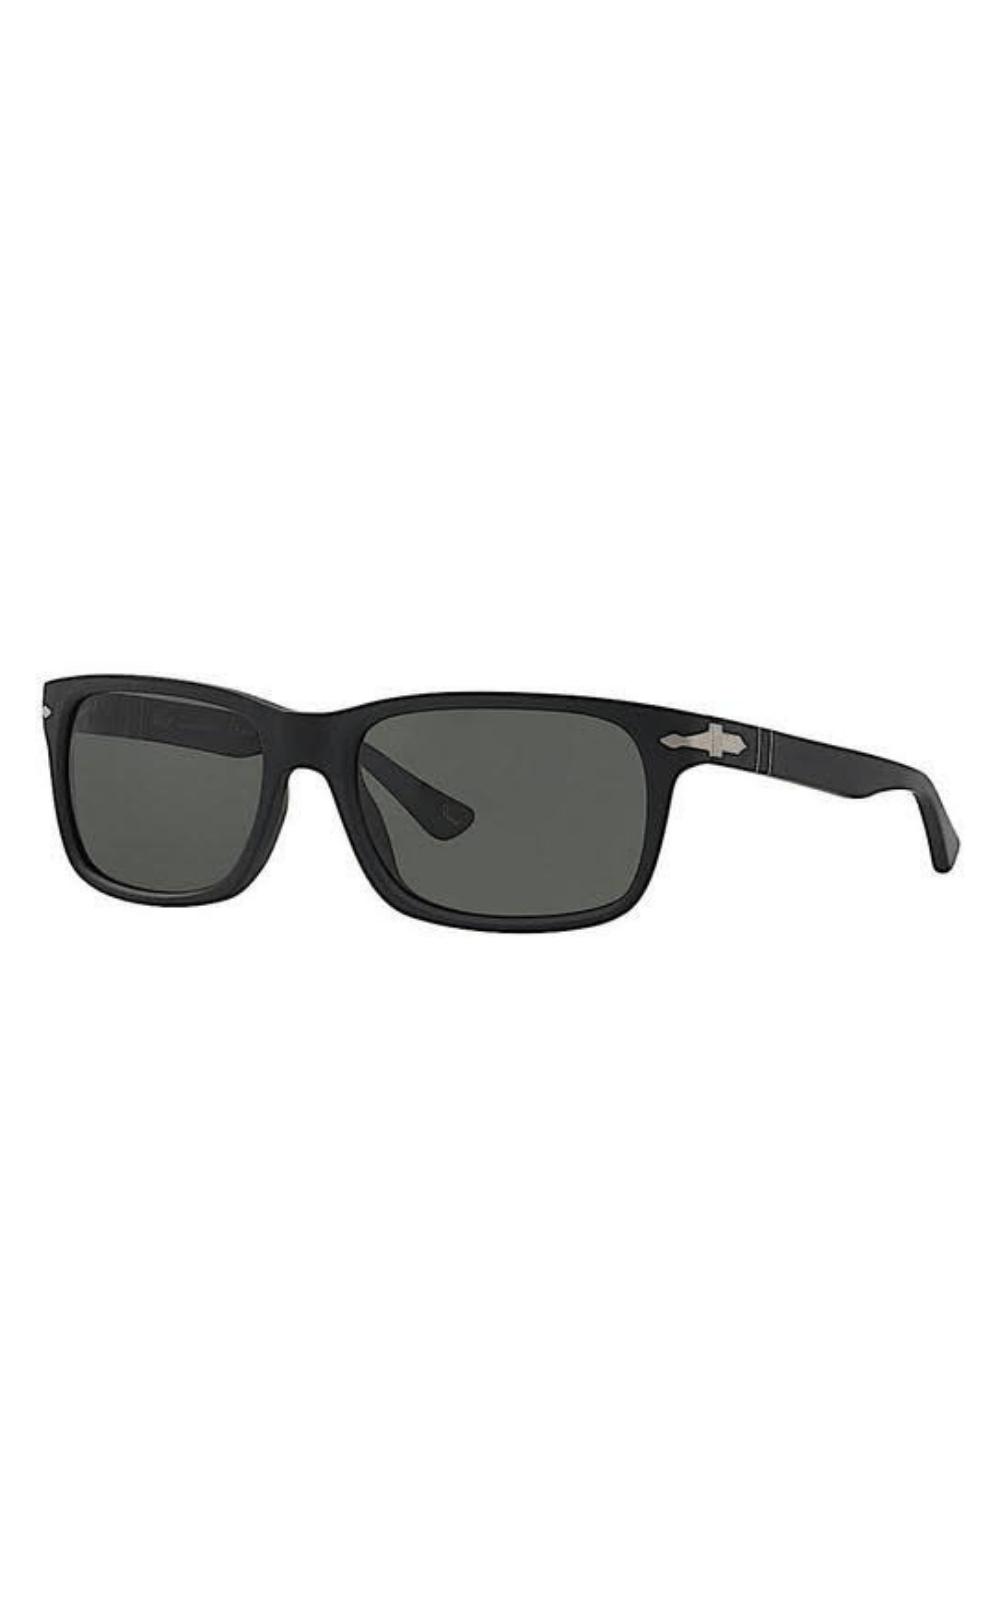 Óculos de Sol Persol 3048S Polarizado 9000 58. undefined d00d43947f